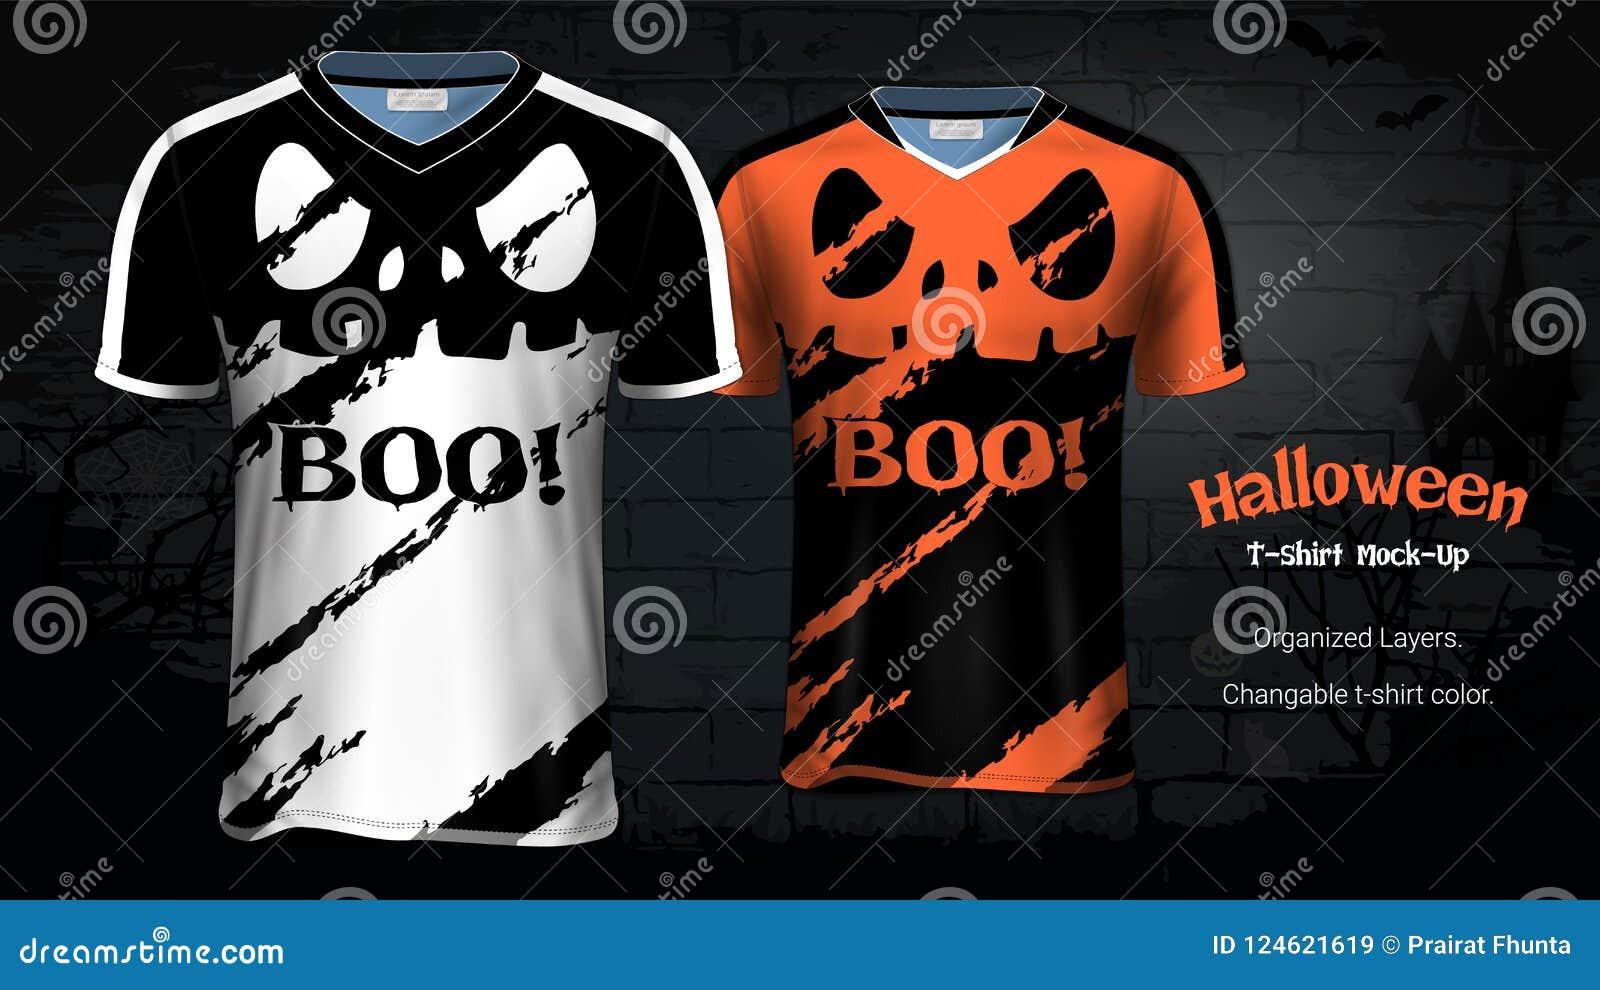 Halloween Costume T-Shirts Mockup Templates Stock Vector ...